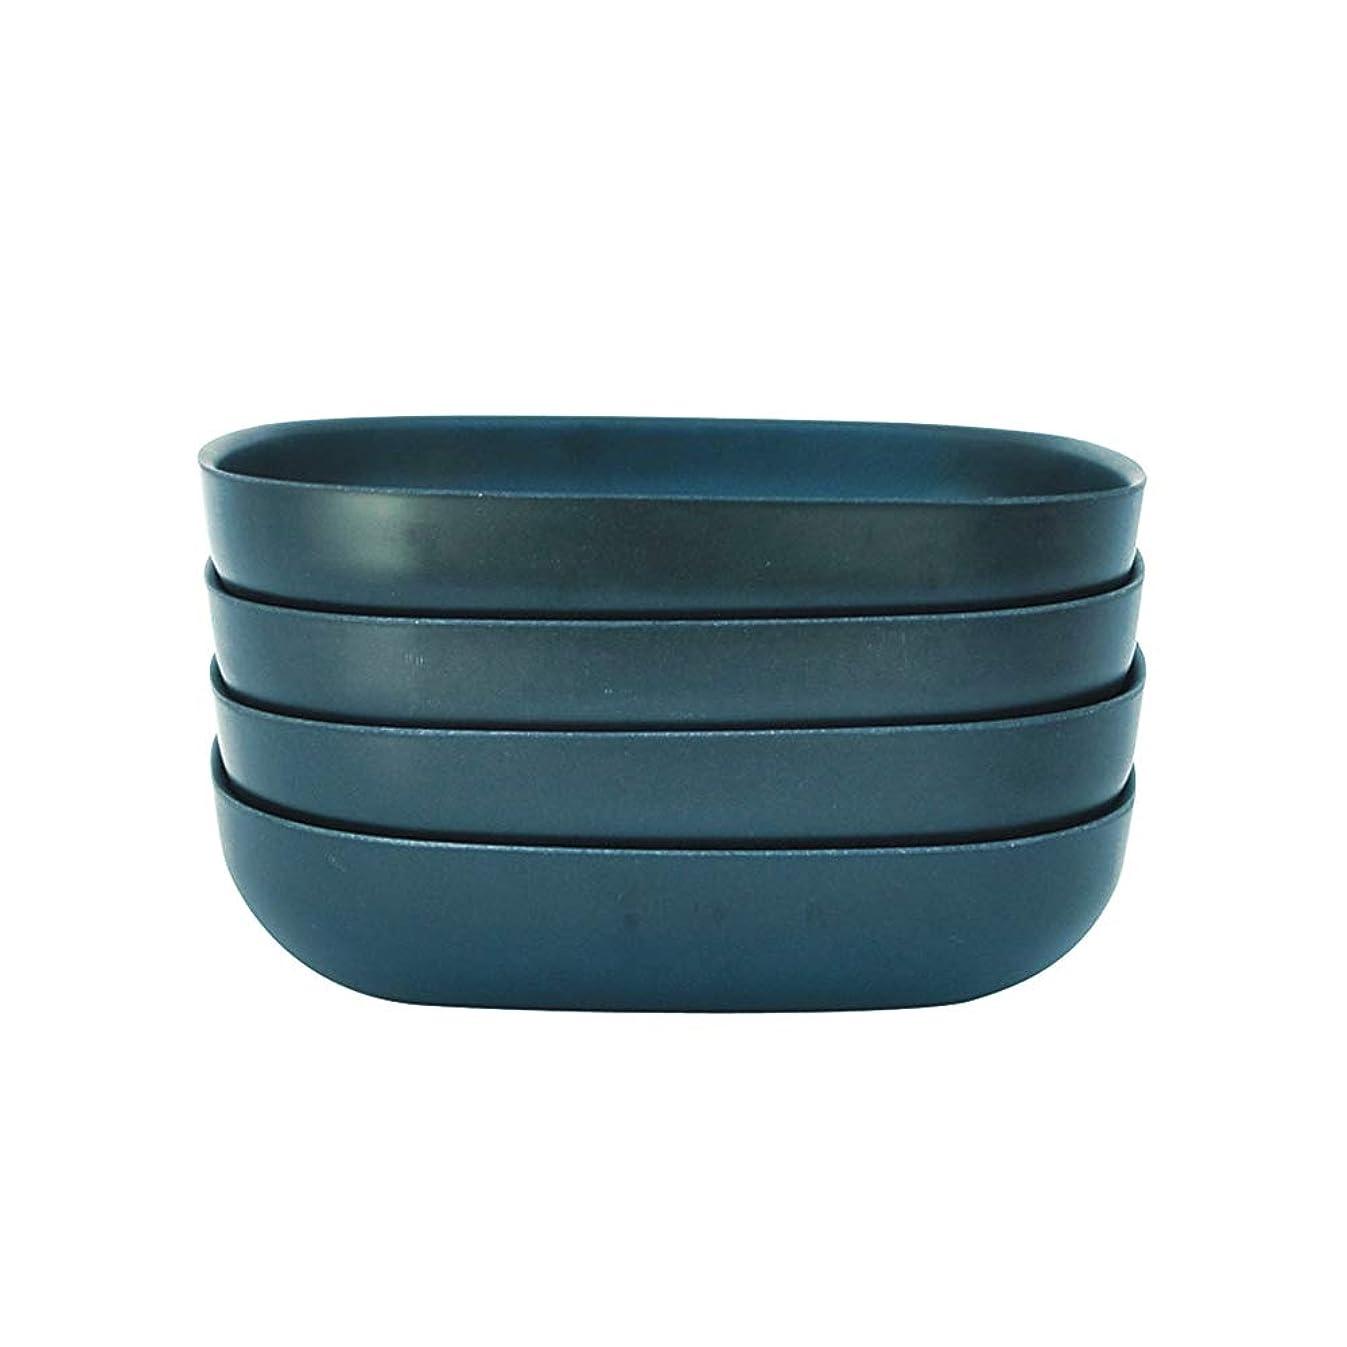 EKOBO  Bamboo 24oz Pasta/Salad Bowl Set, Service for 4, BIOBU Eco-material, Indoor/Outdoor dining, Dark Blue (Abyss)